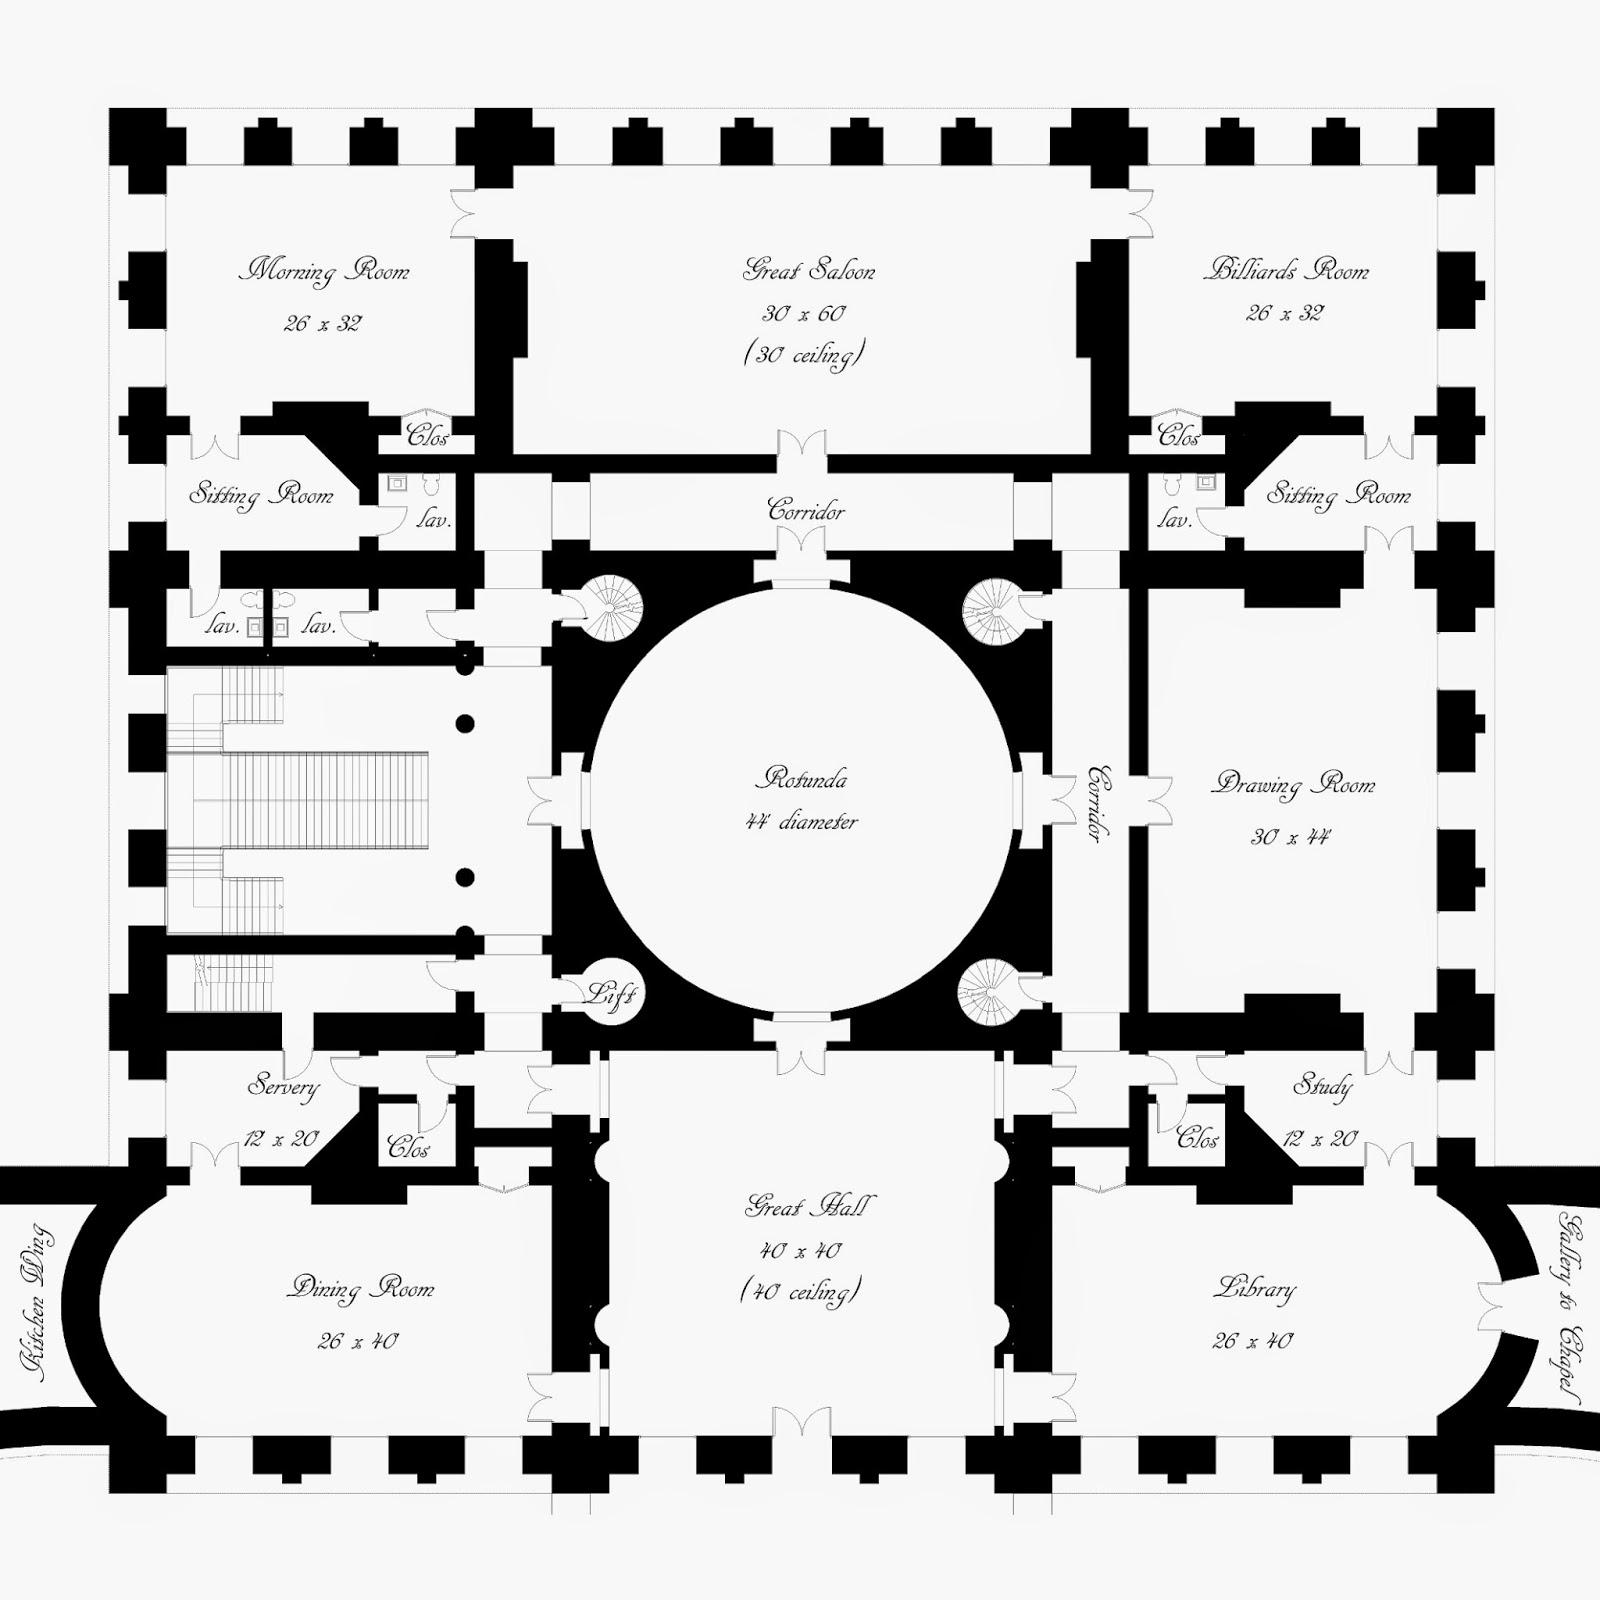 Amazing Knole House Floor Plan Pictures Exterior ideas 3D gaml – Hatfield House Floor Plan